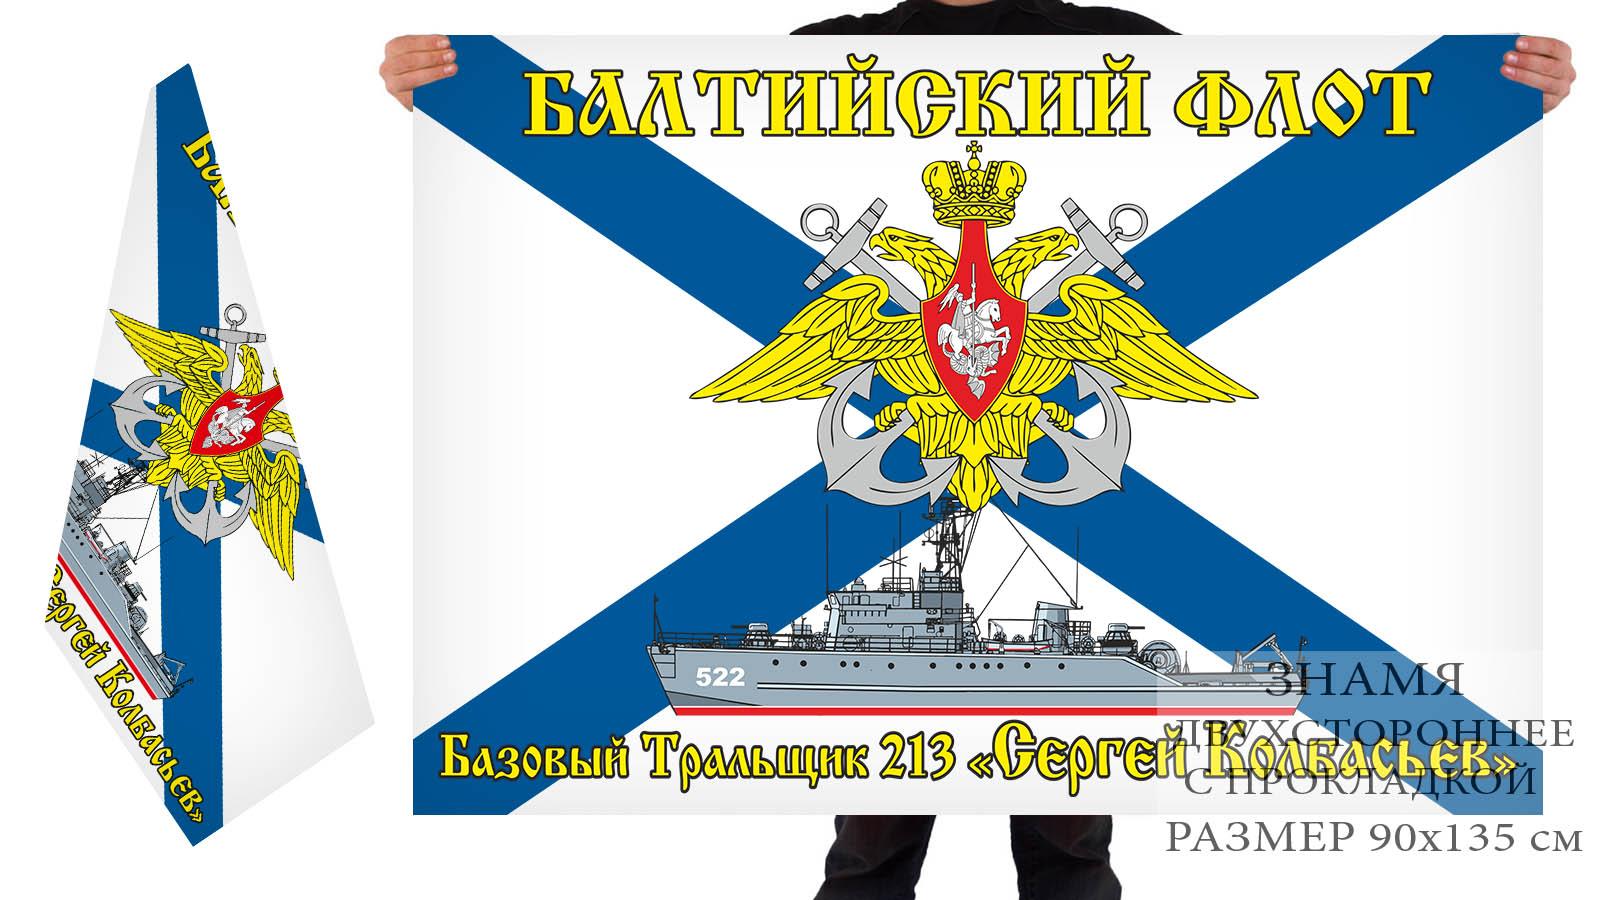 Двусторонний флаг БТ 213 Сергей Колбасьев